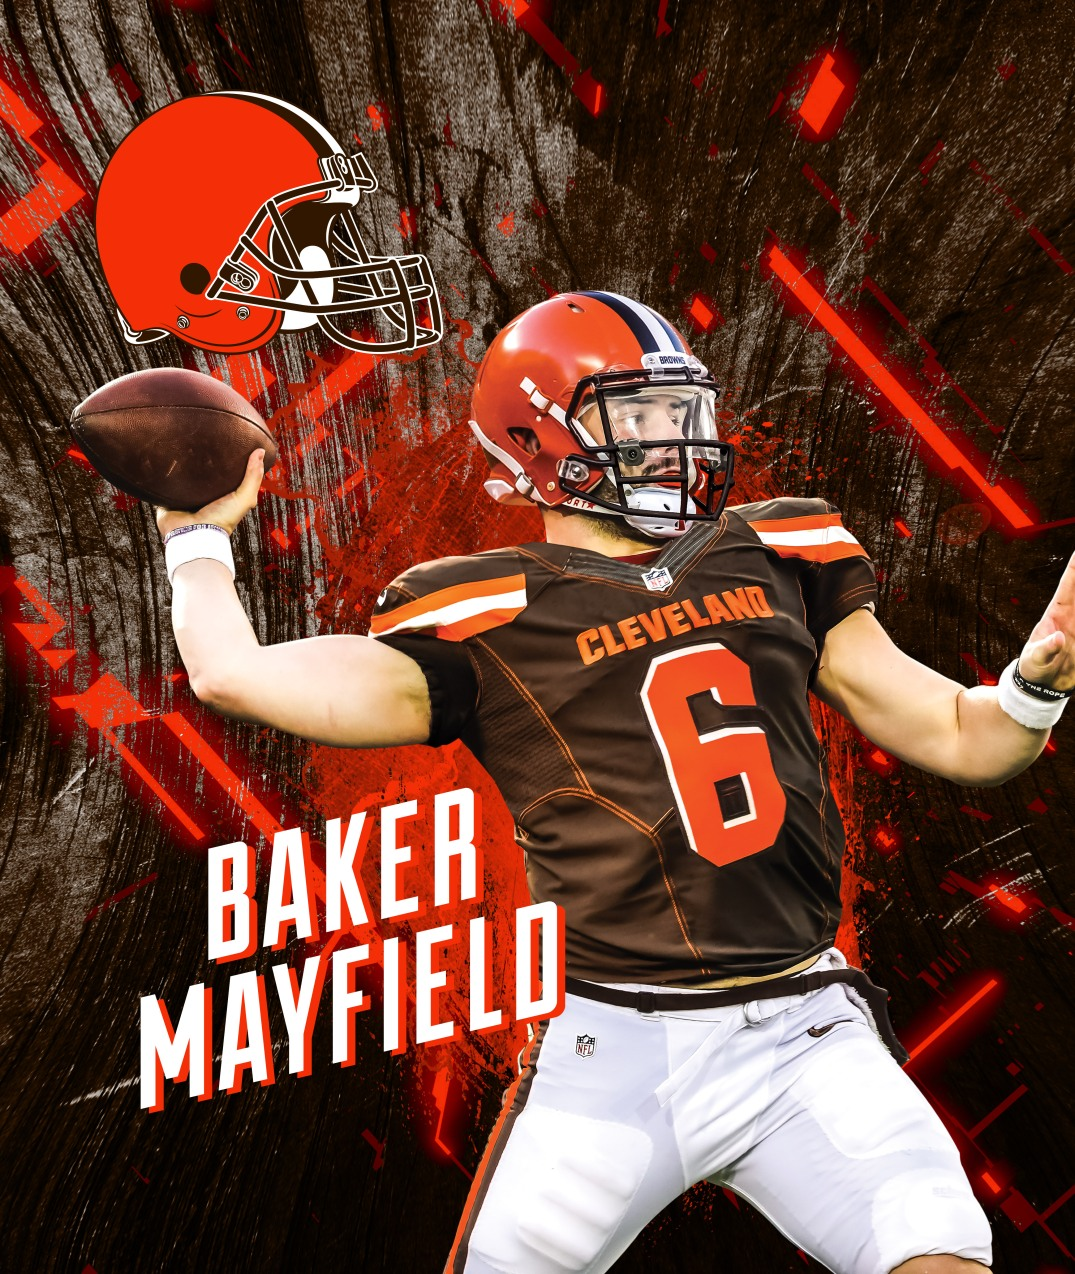 575_nfl_BakerMayfield